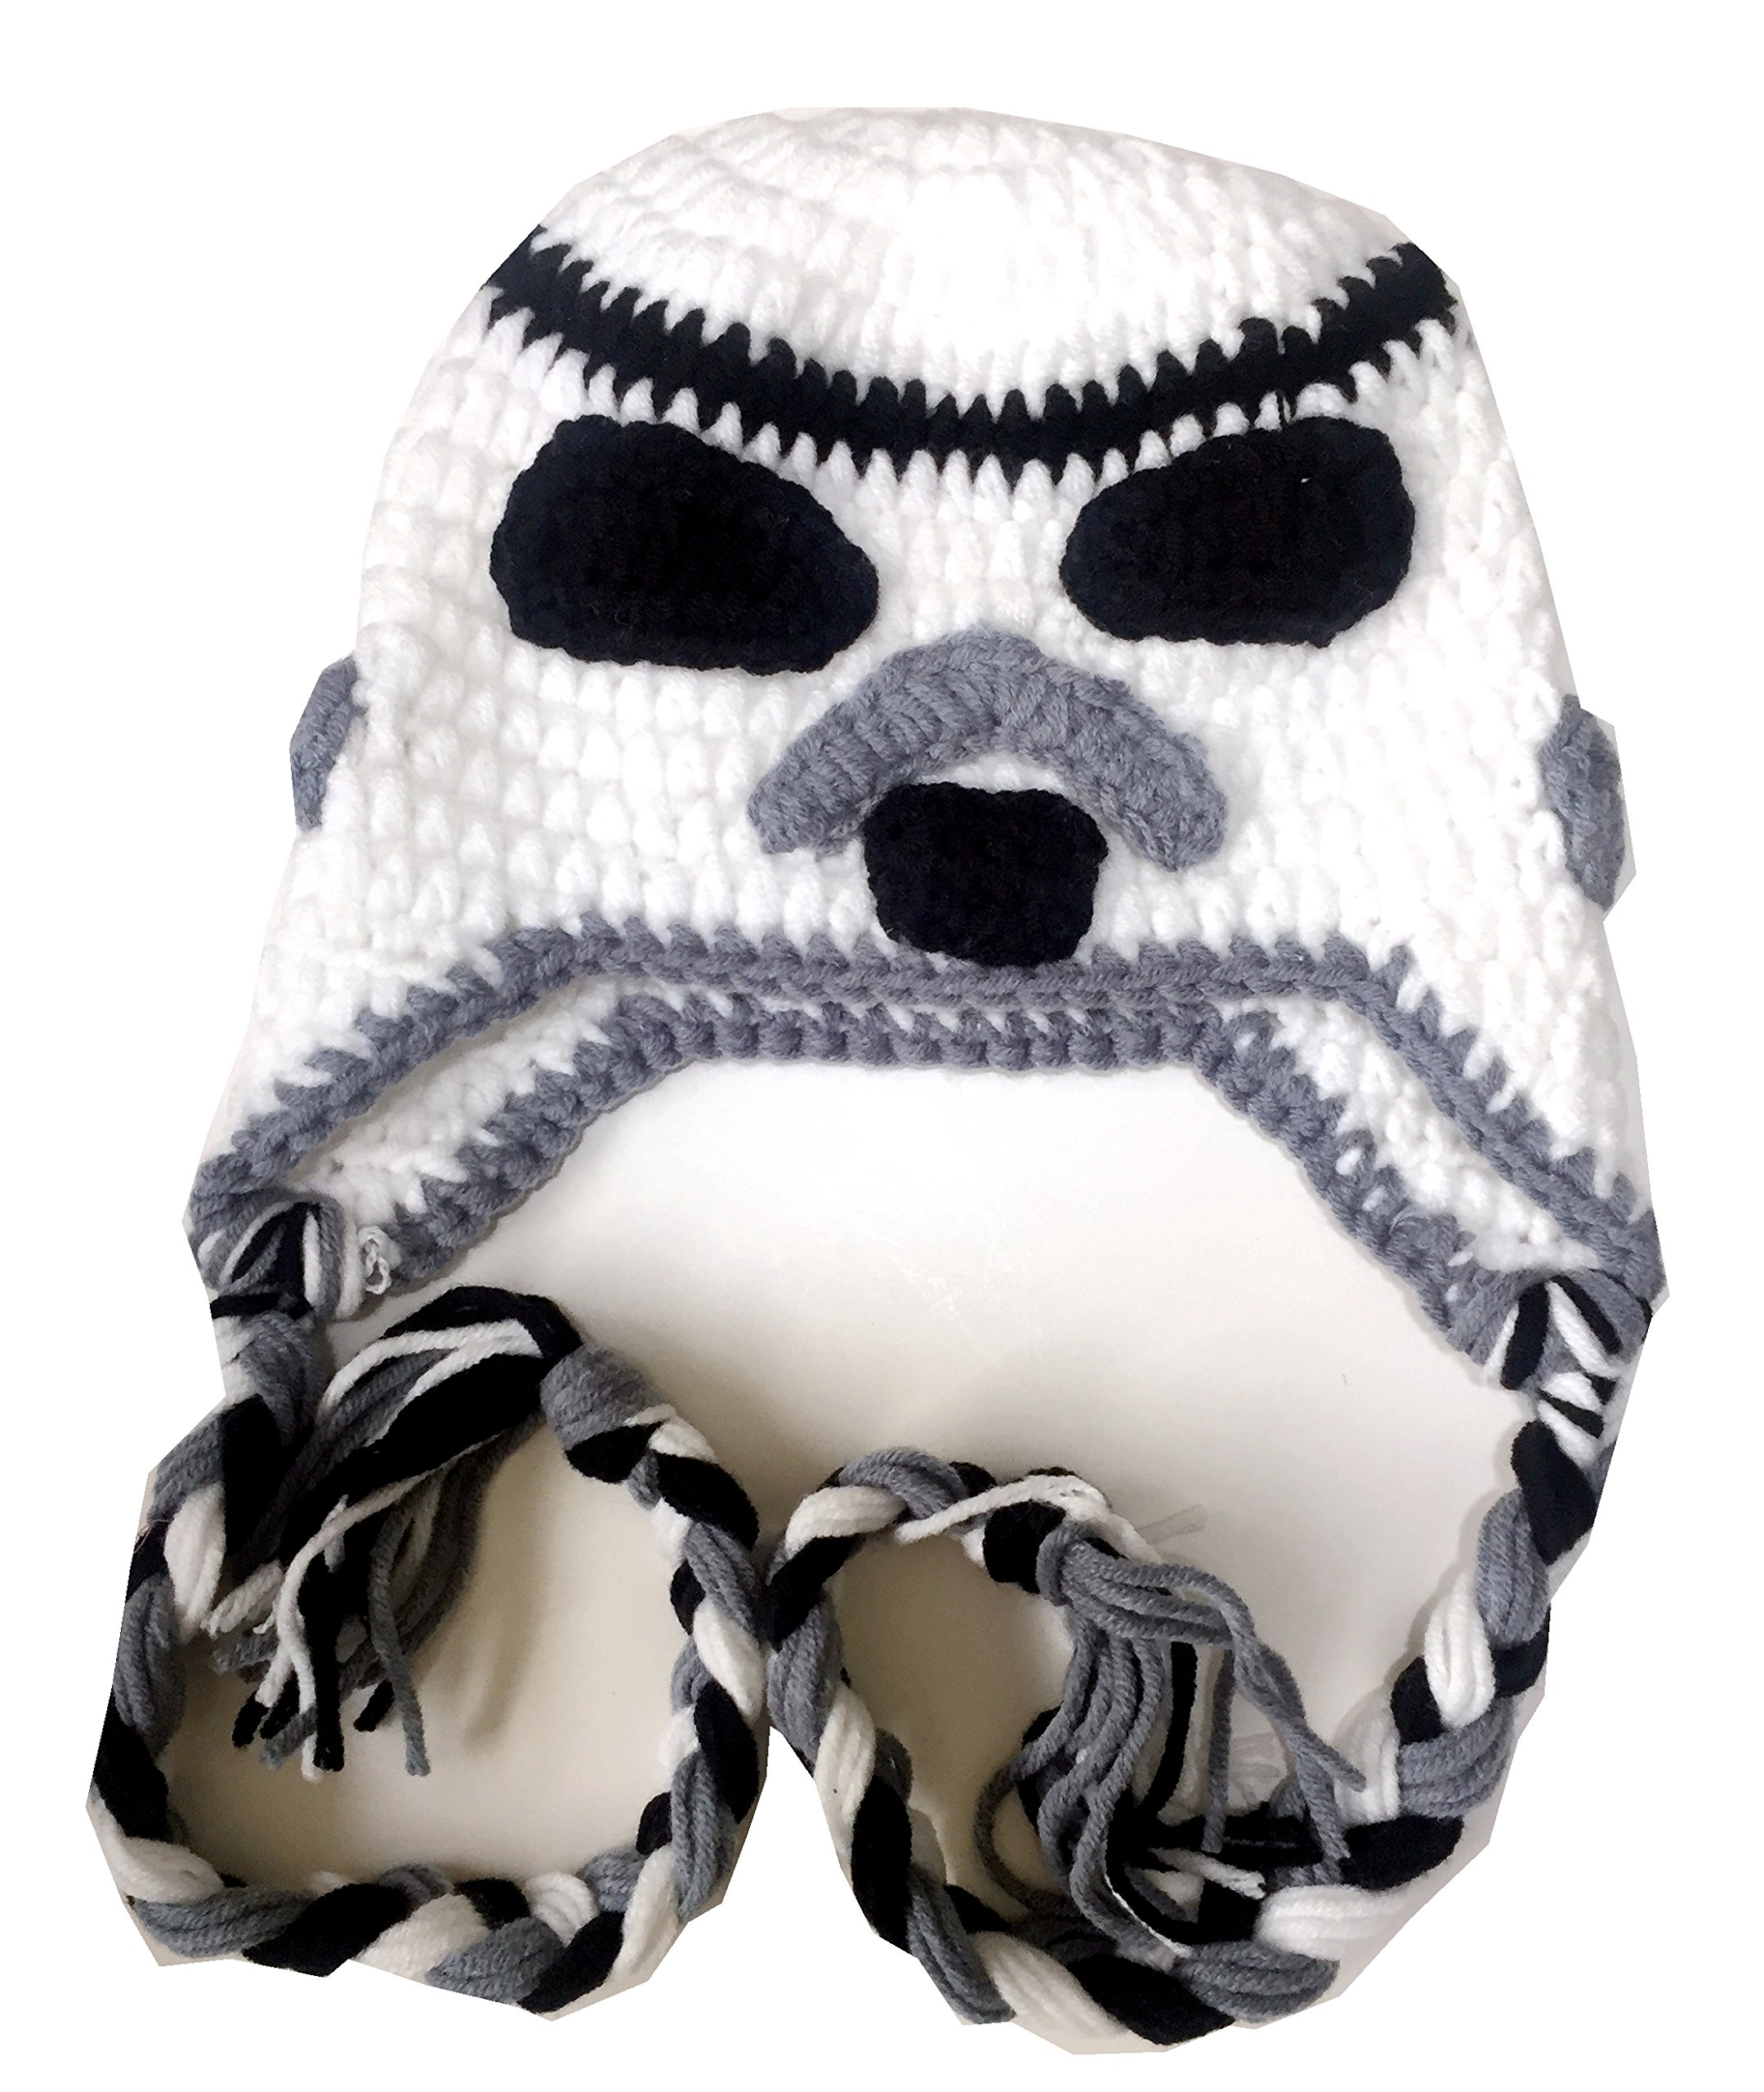 Milk protein cotton yarn handmade Stormtrooper hat - fits 3-12 month old baby